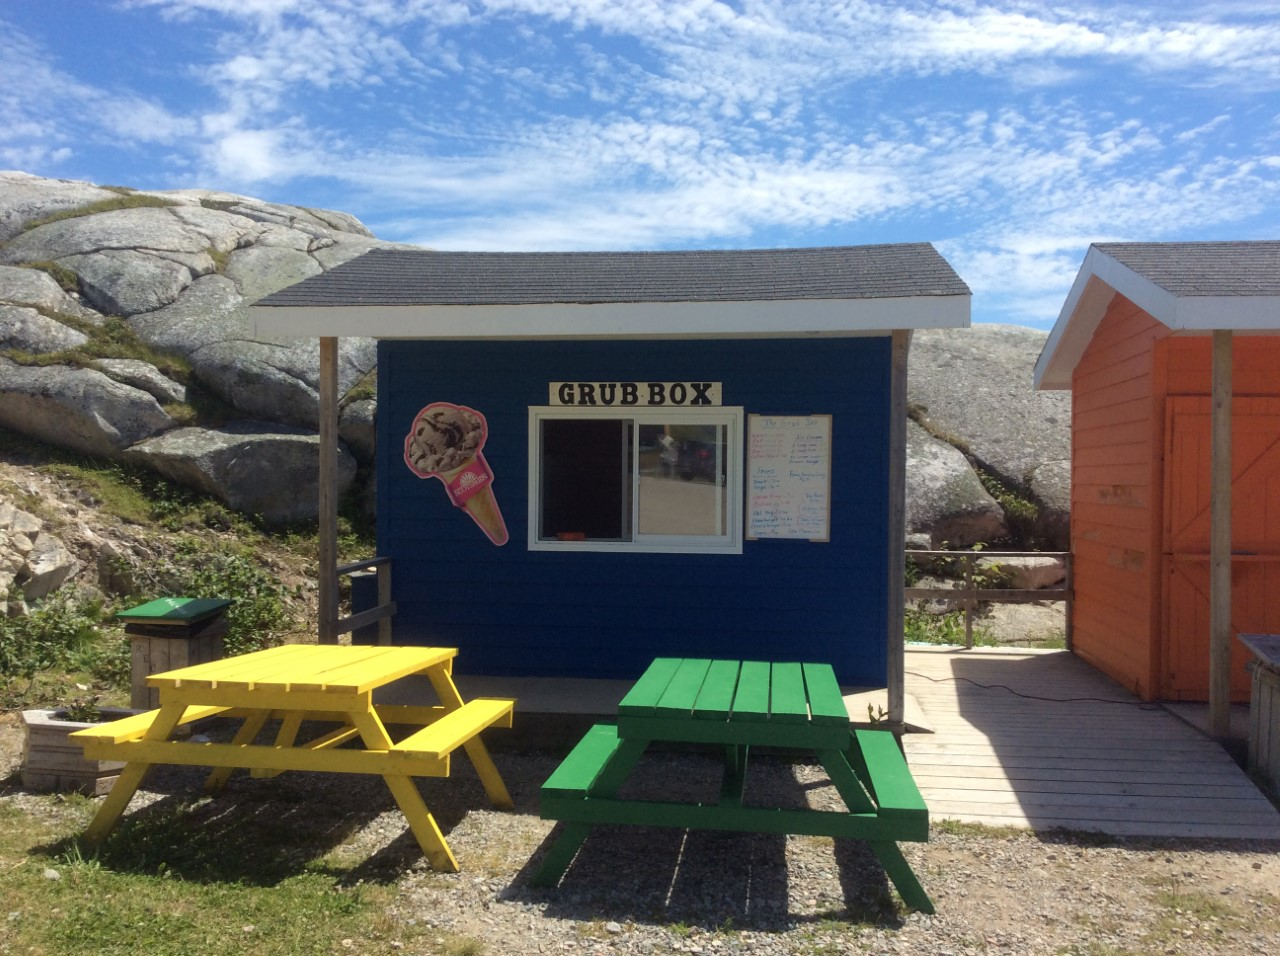 The Grub Box ( A takeout Food Kiosk)